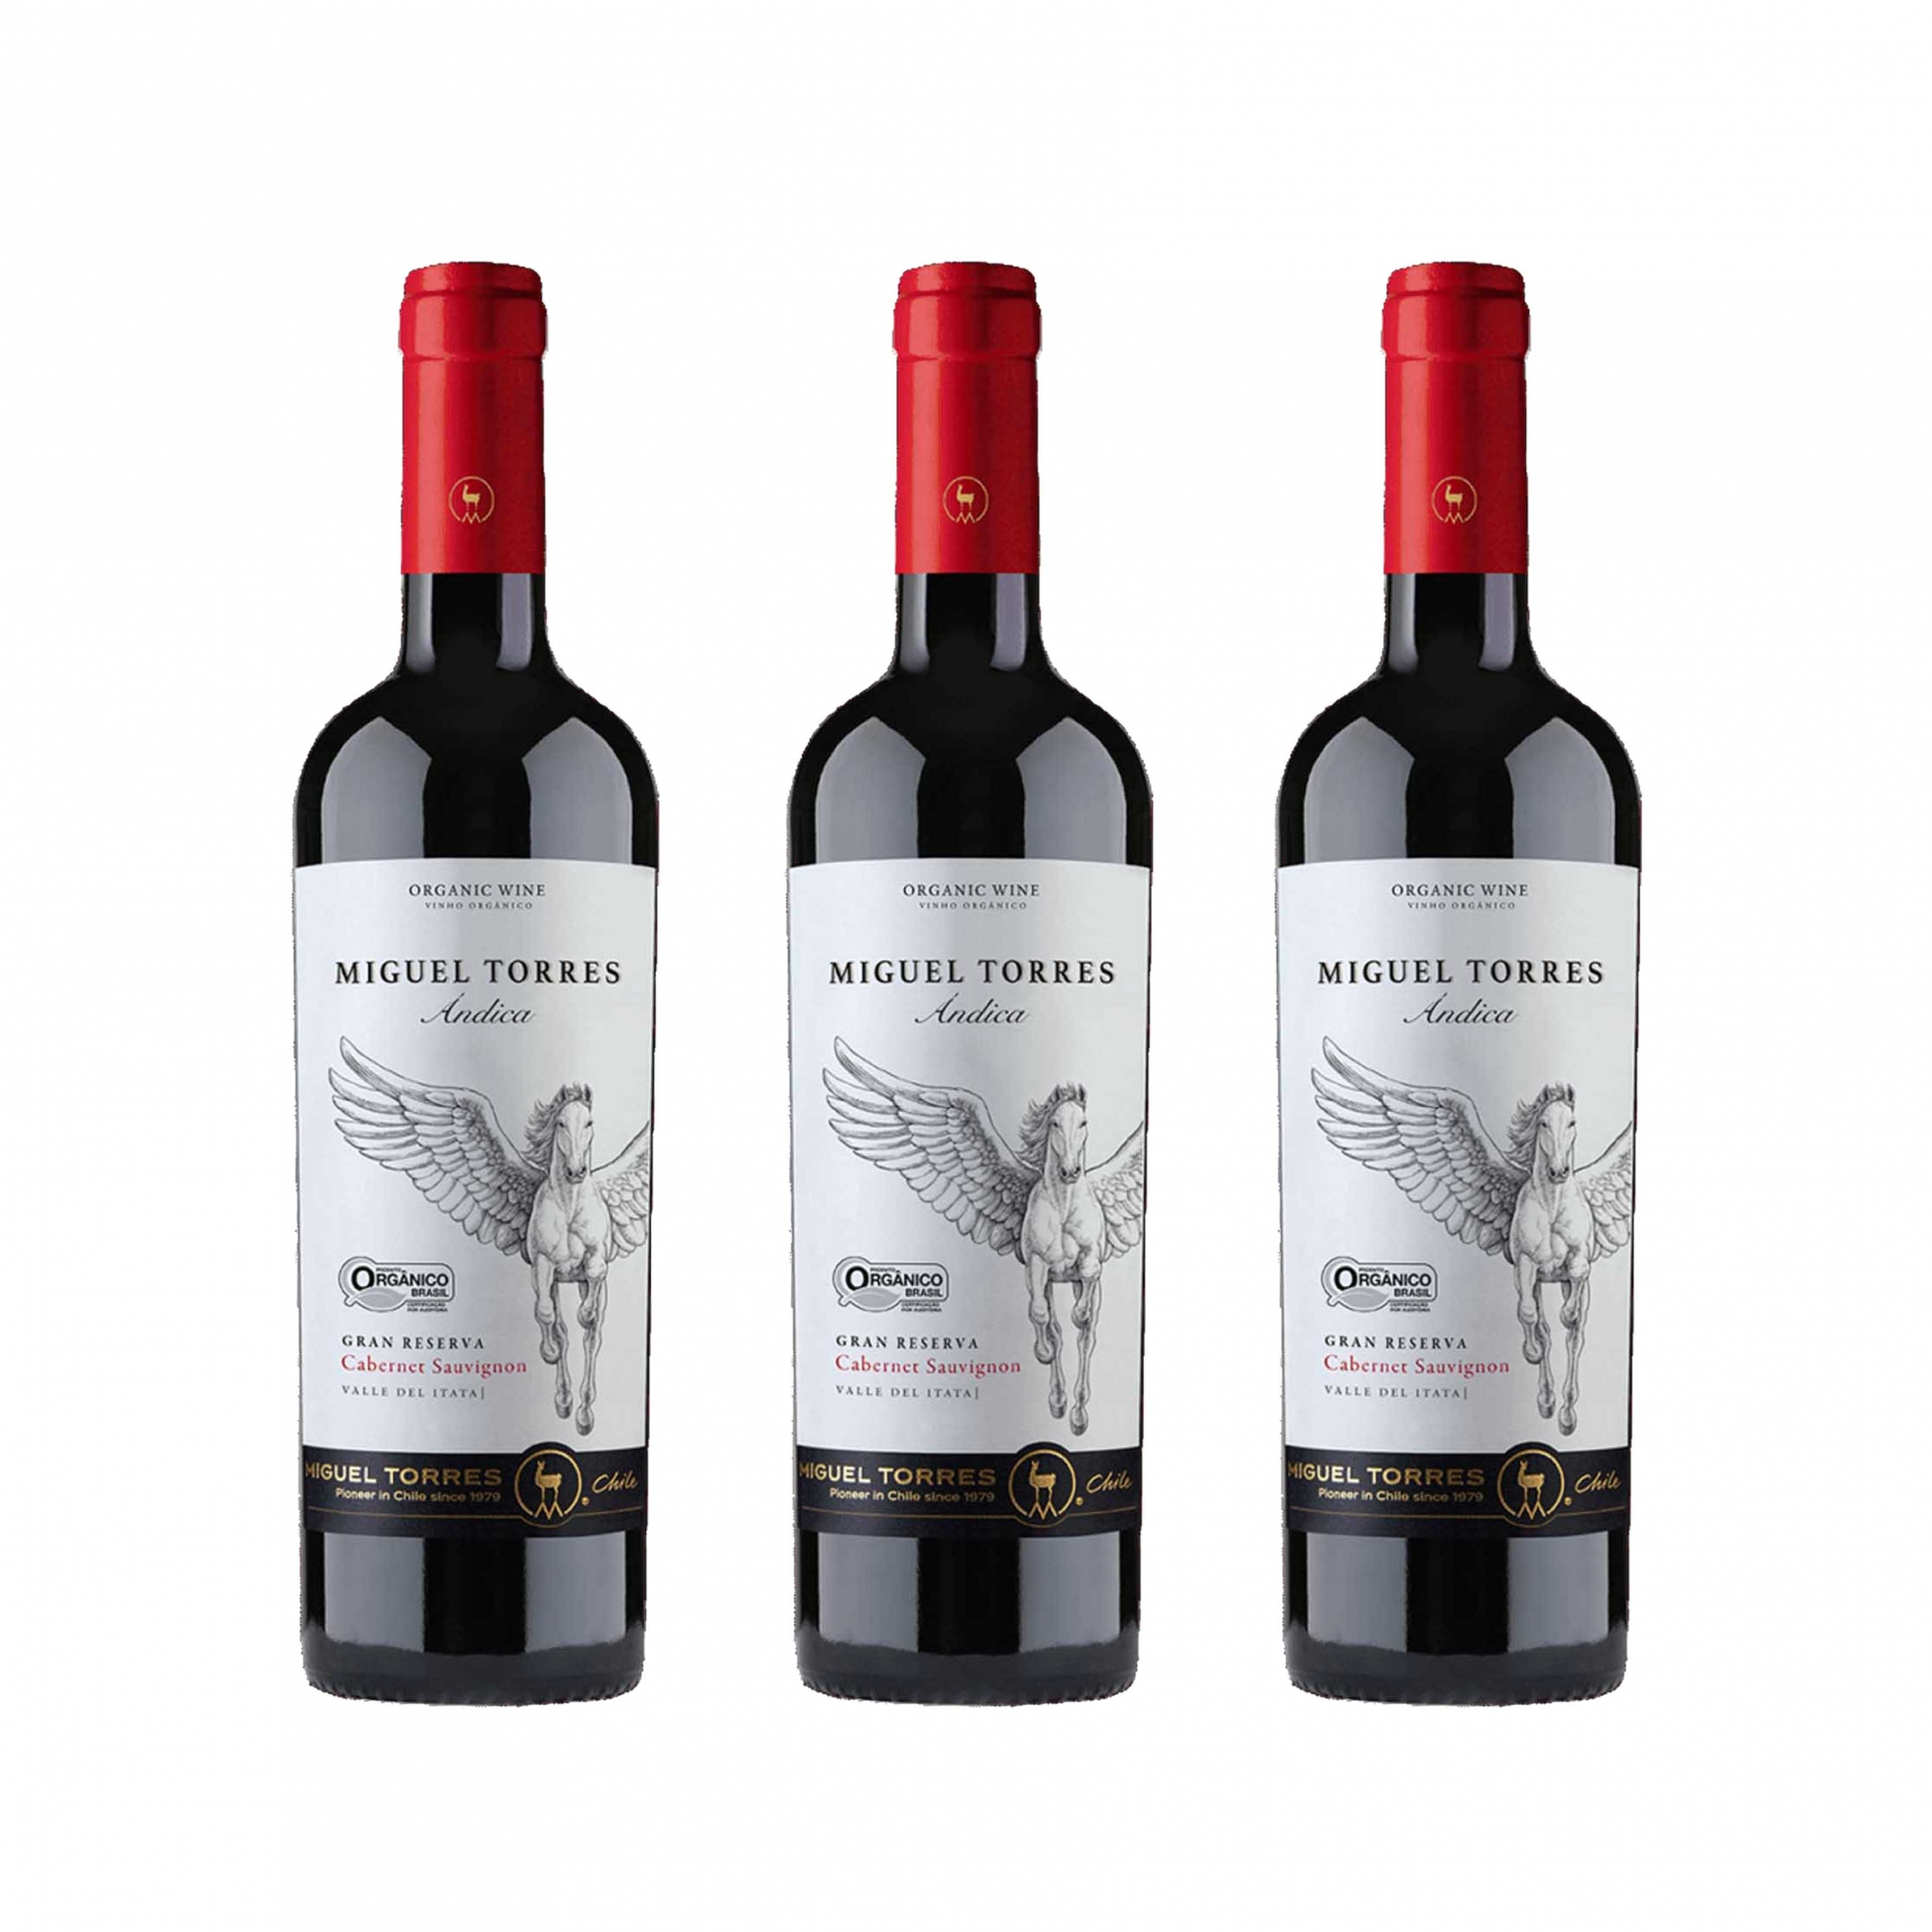 Kit 3x Vinho Tinto Chileno Orgânico Miguel Torres Cabernet Sauvignon 2019